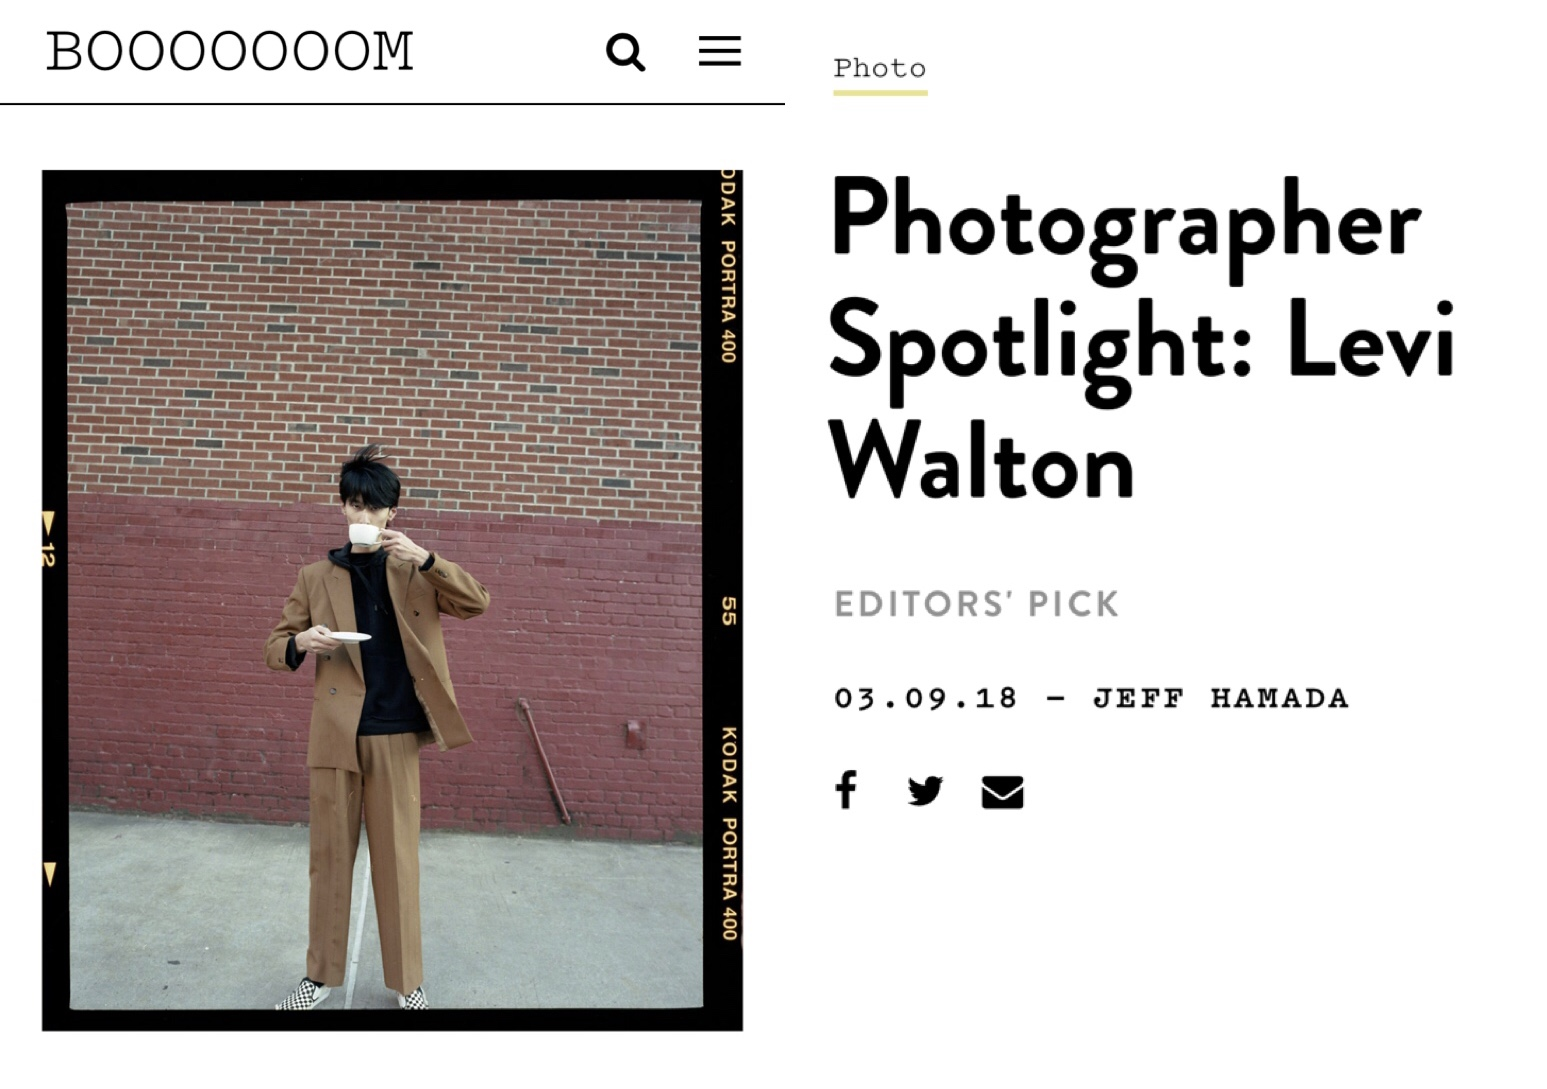 BOOOOOOOM Photographer Spotlight: Levi Walton